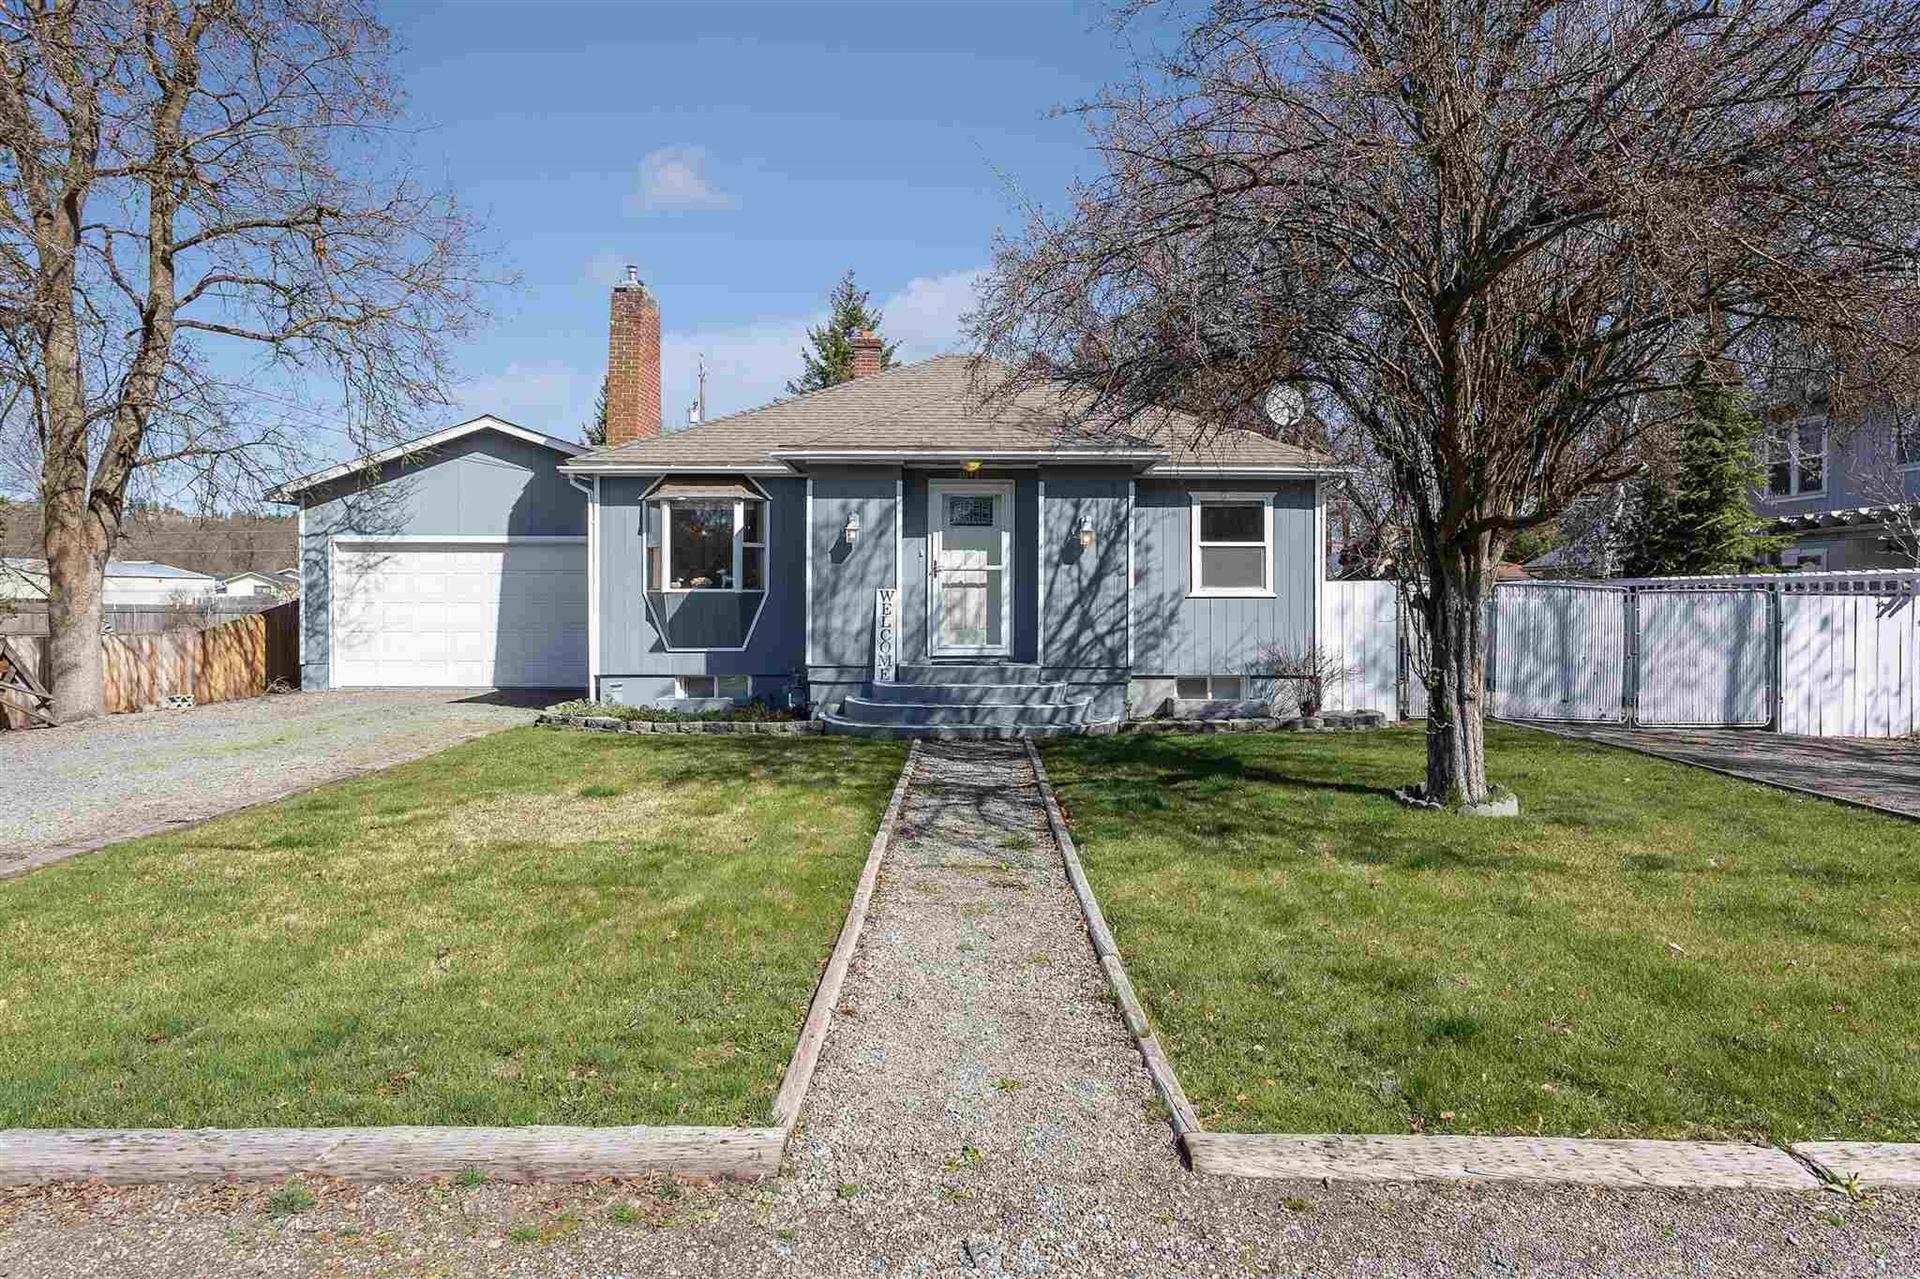 8013 E Fairview Ave, Spokane Valley, WA 99212 - #: 202113736